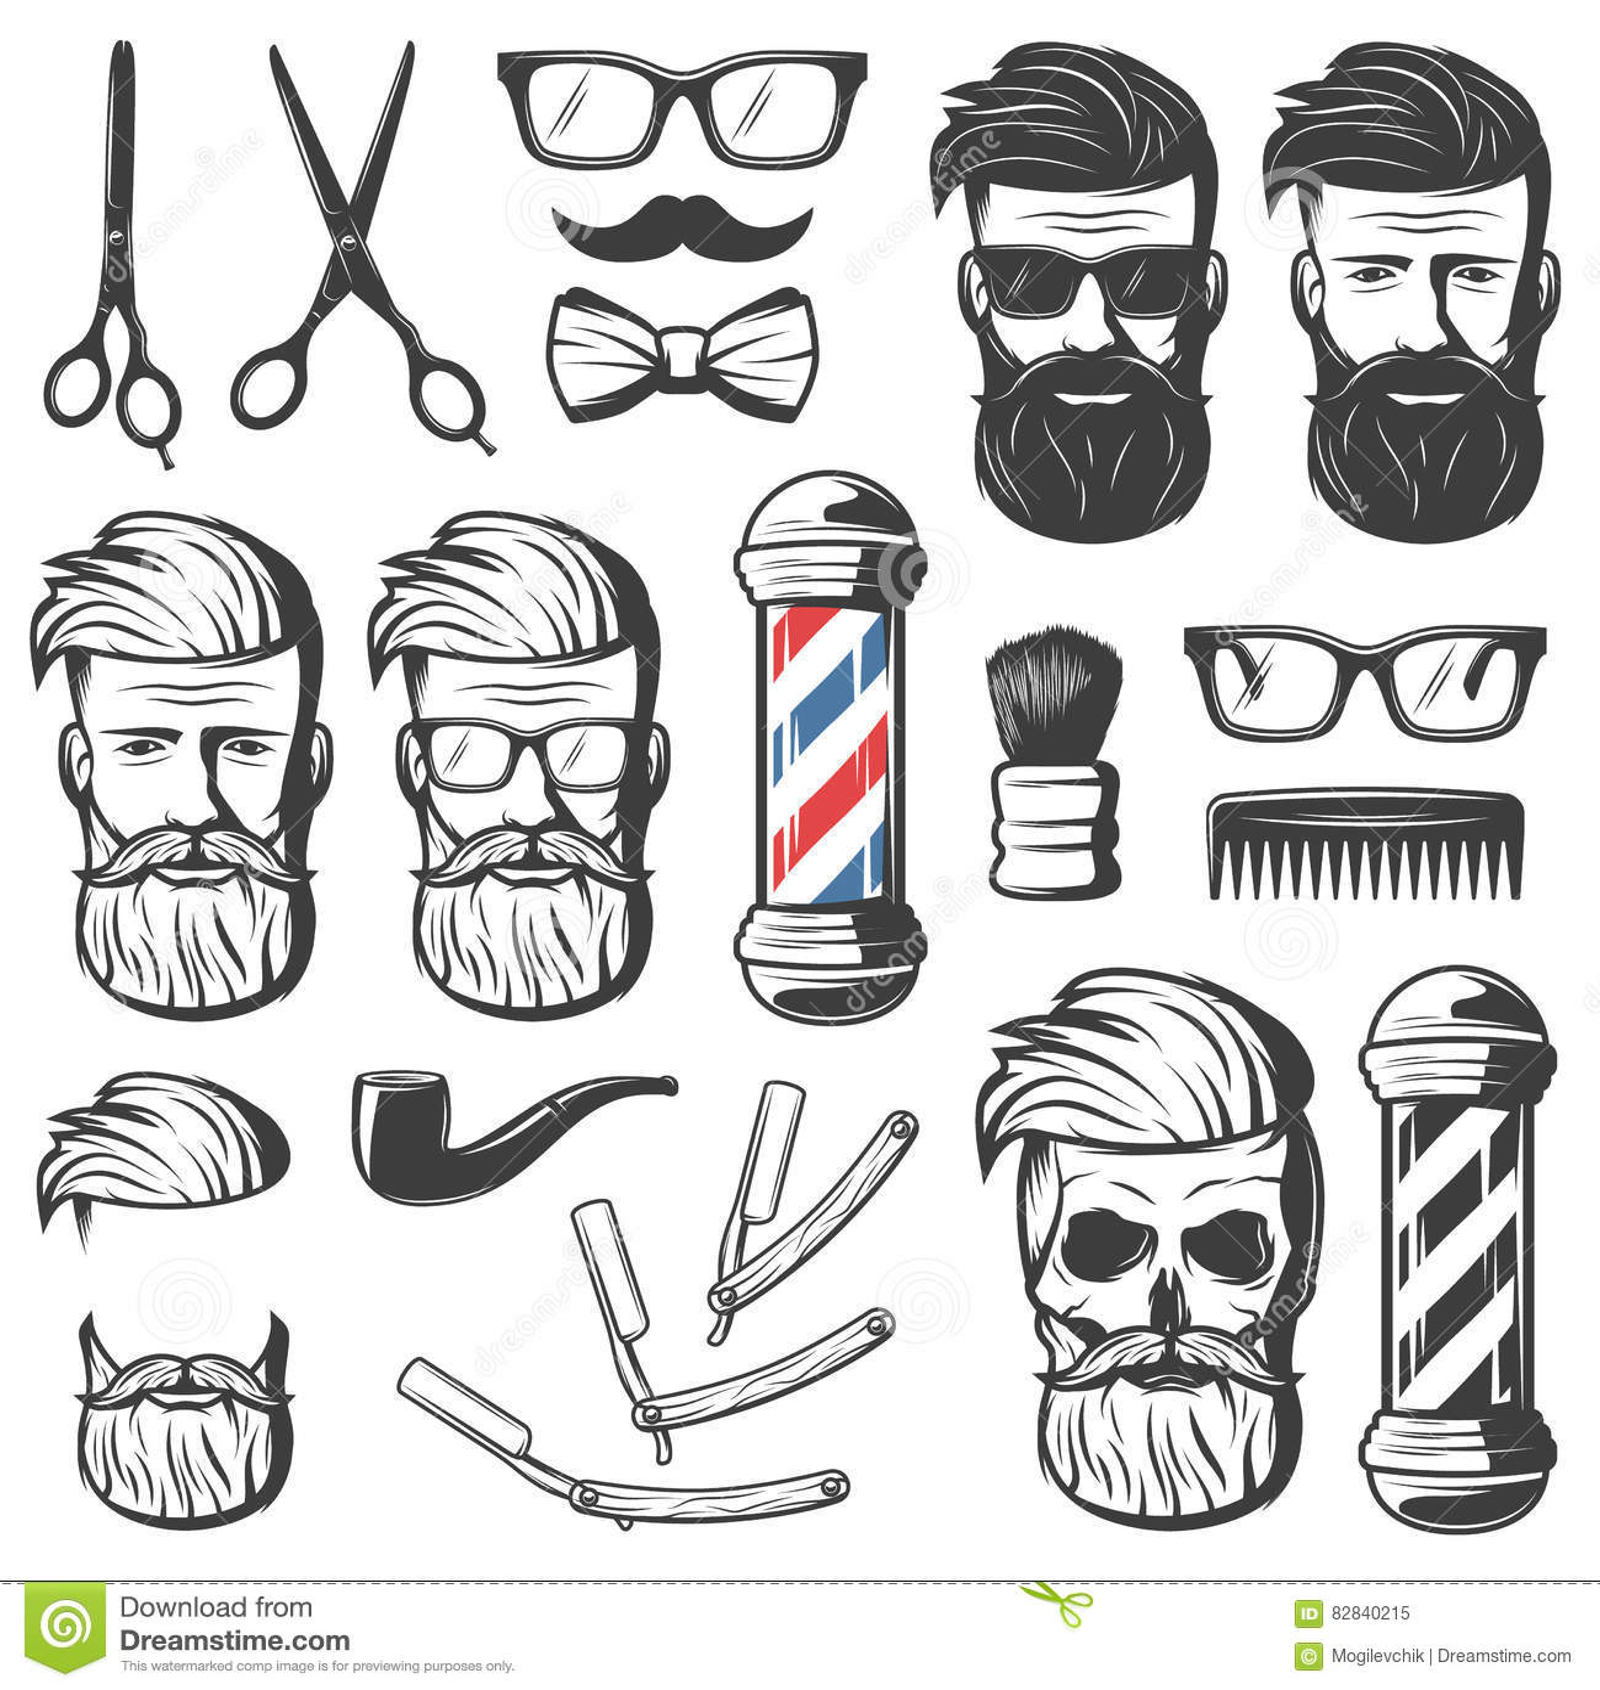 Barber Set Of Shop Elements And Shave Icons Illustration